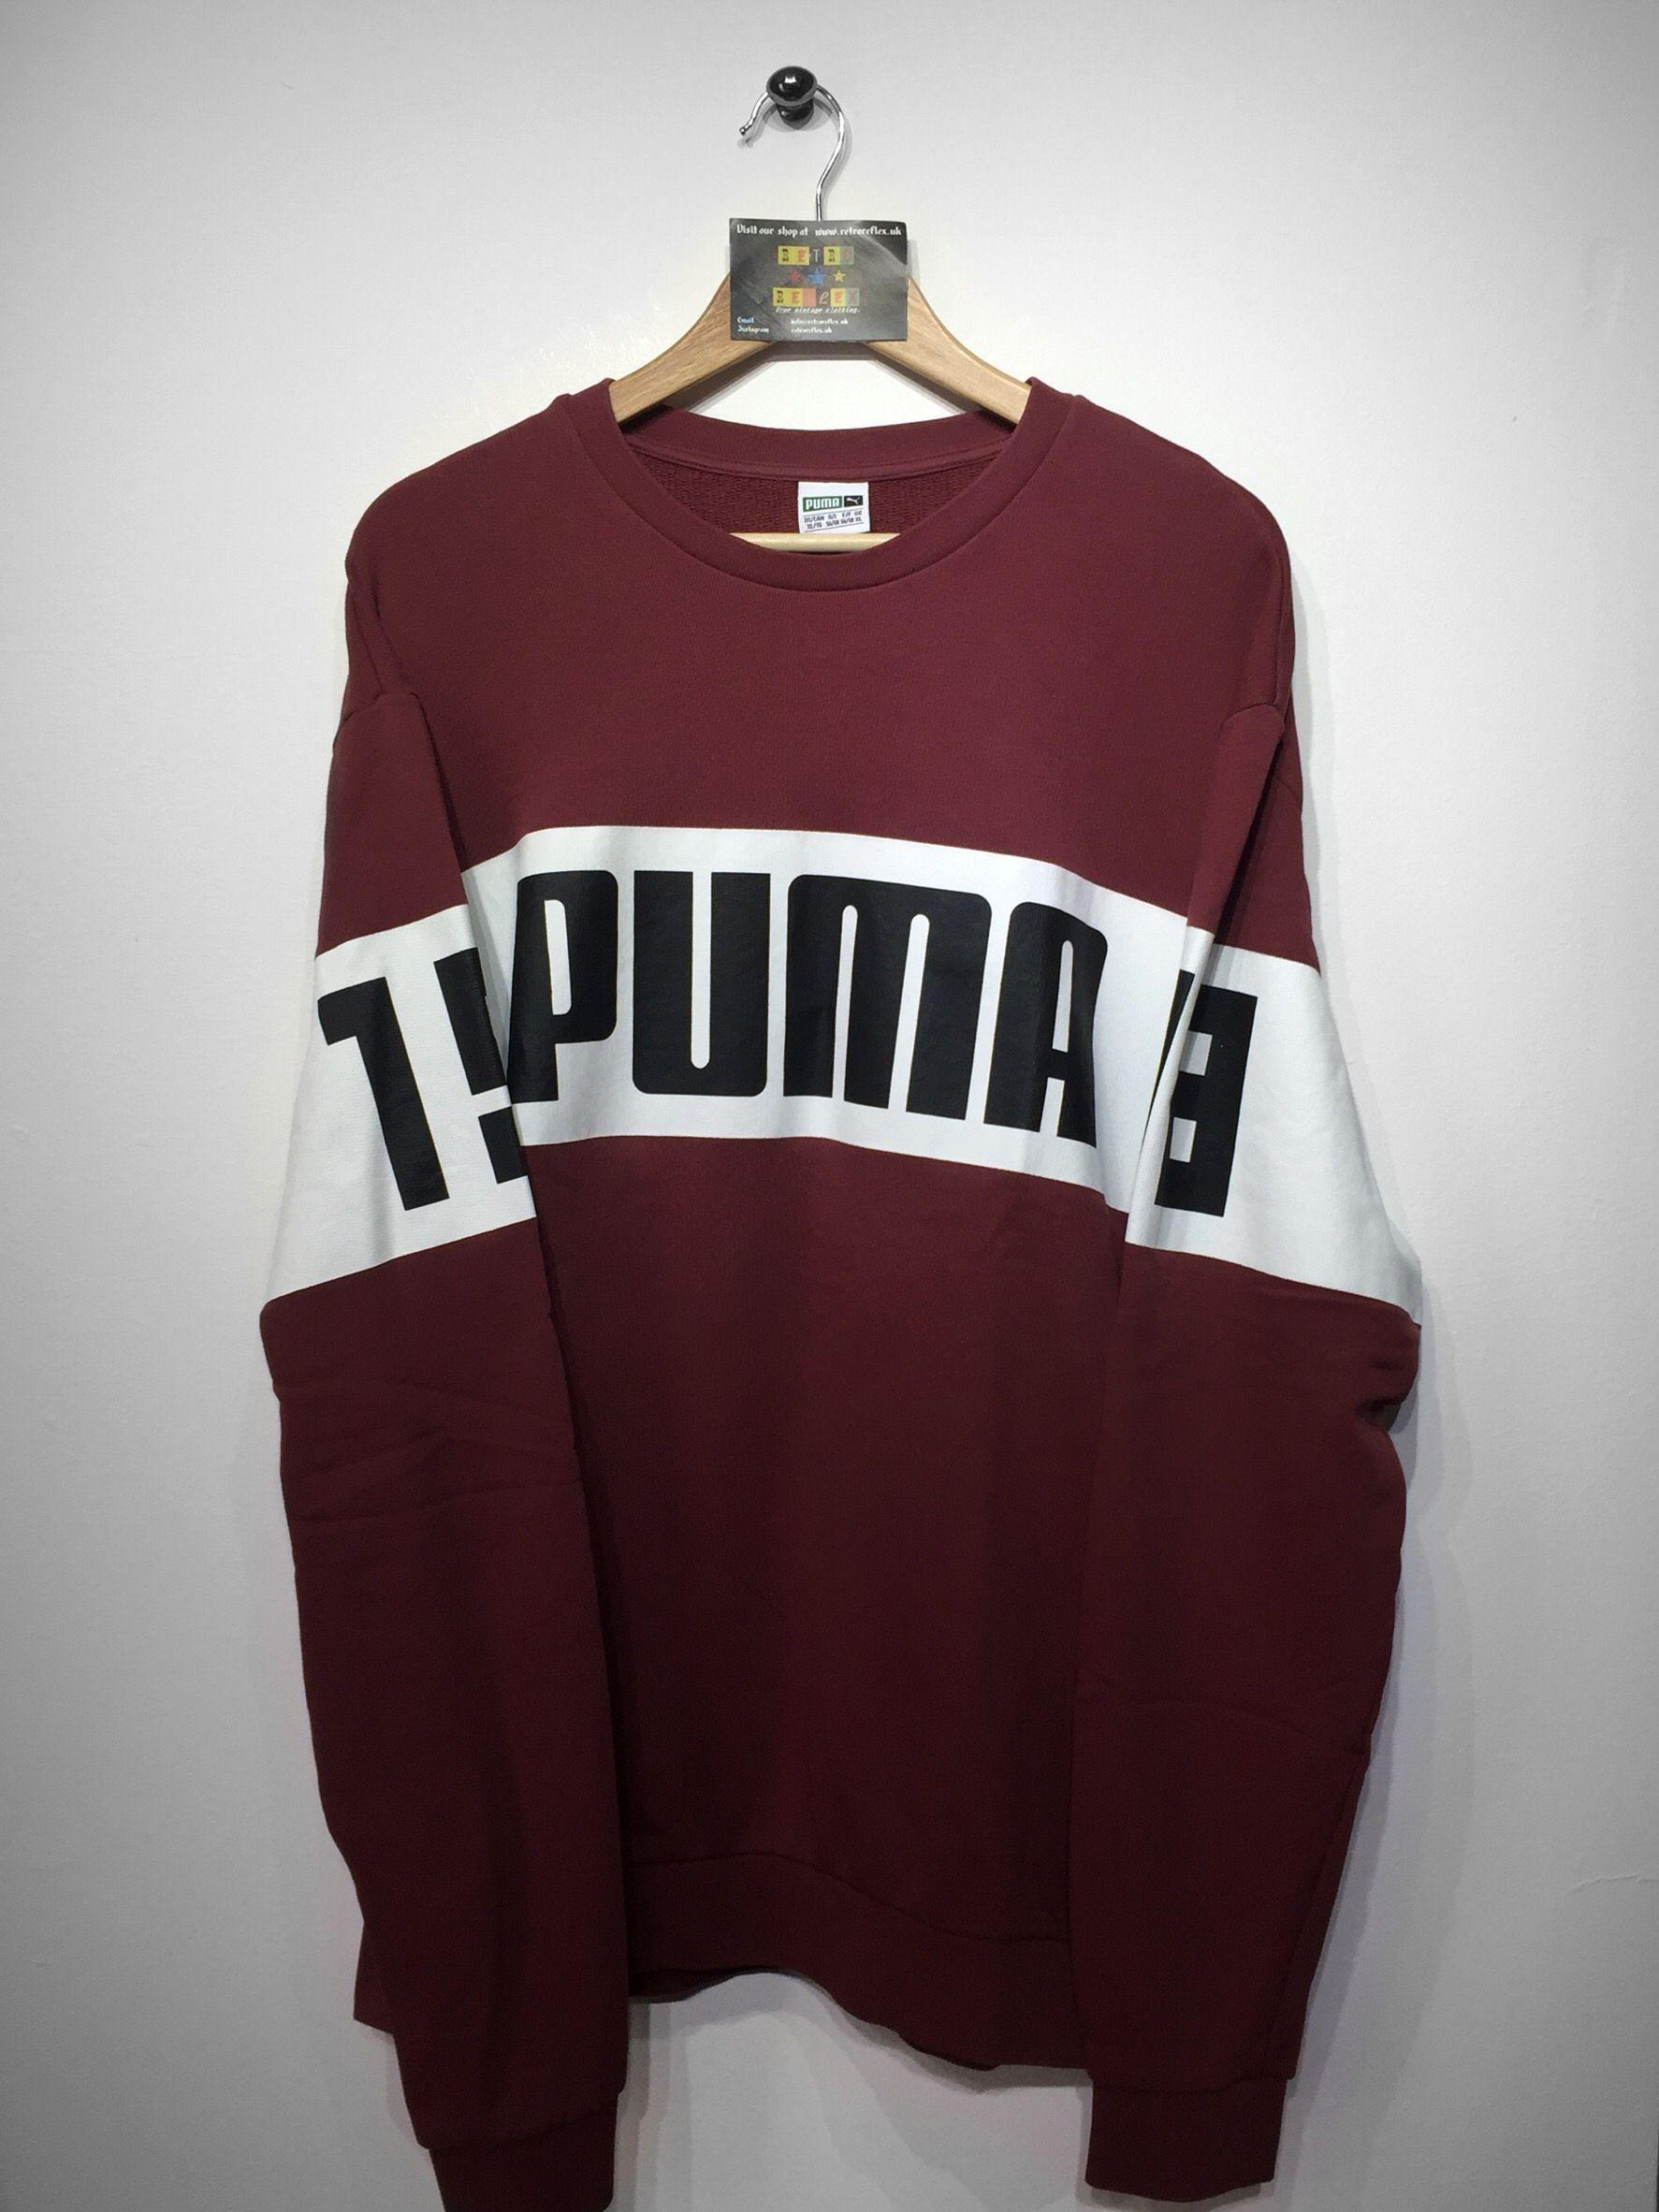 d307db1b0e6d Puma sweatshirt size X Large (but Fits Oversized) £36 Website ...